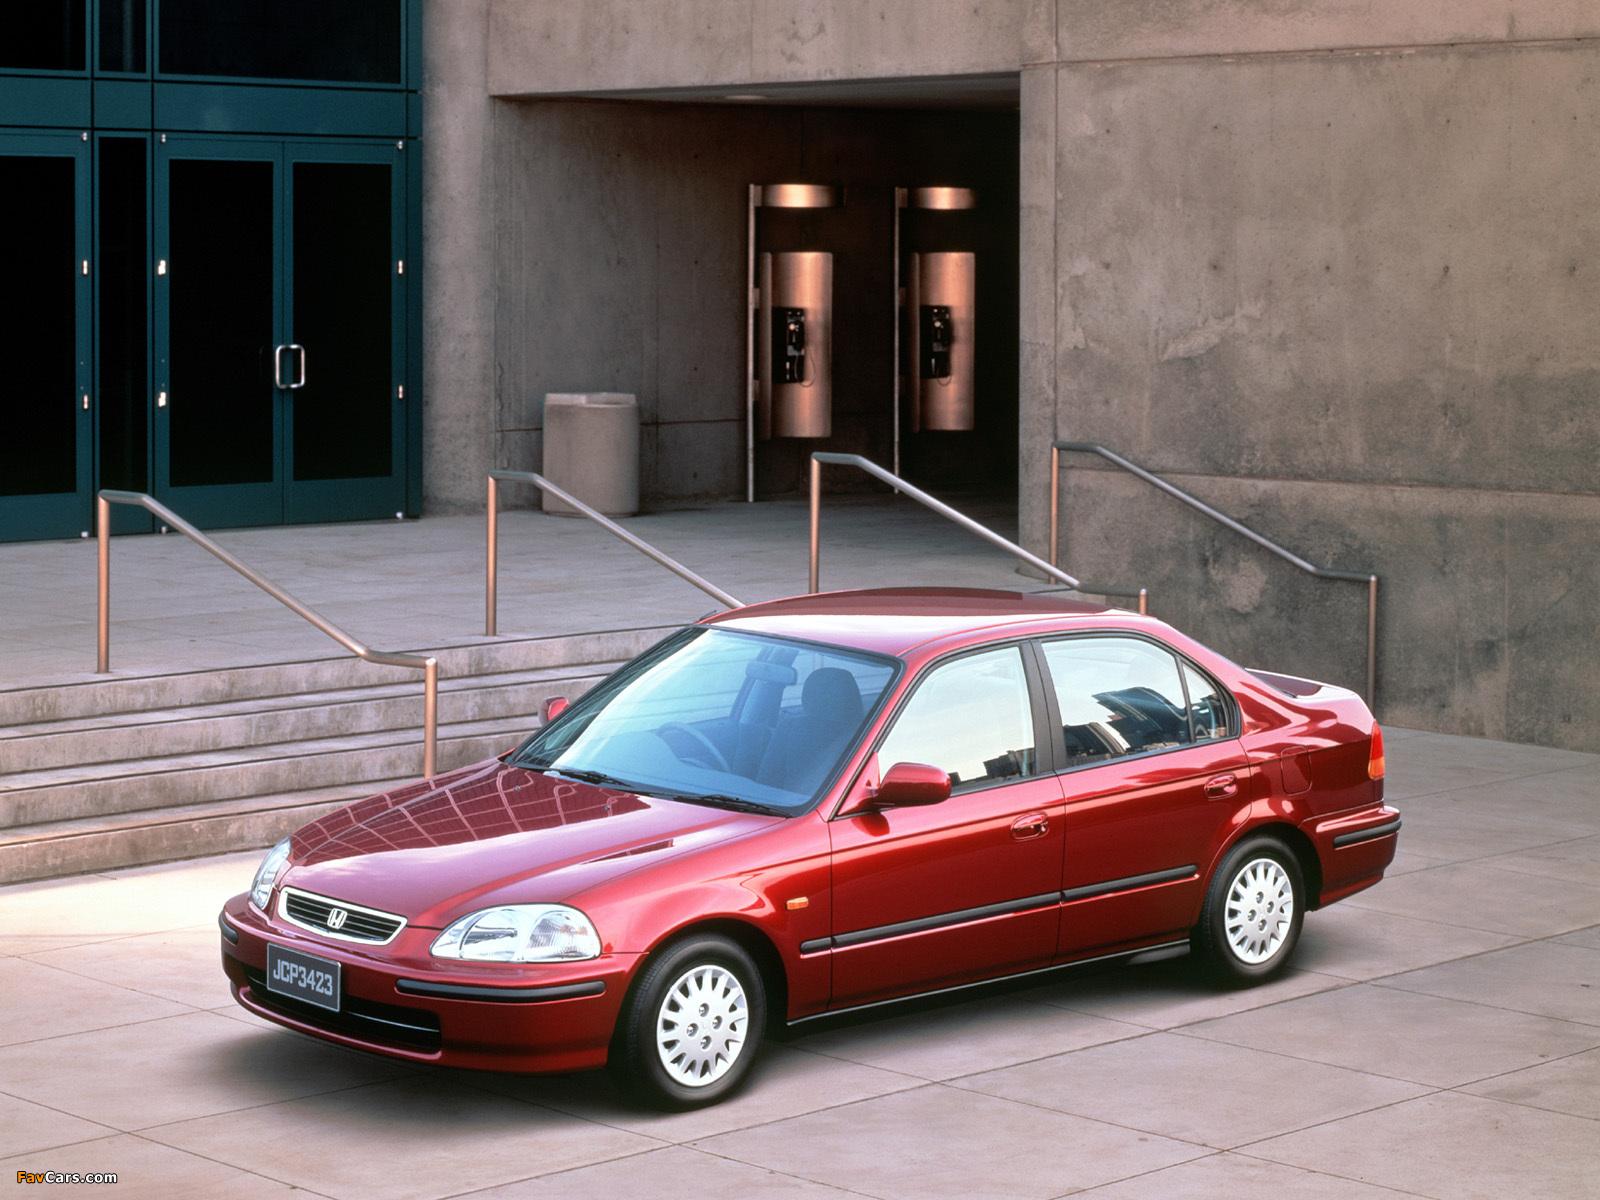 Kelebihan Kekurangan Harga Mobil Bekas Honda Murah Berkualitas